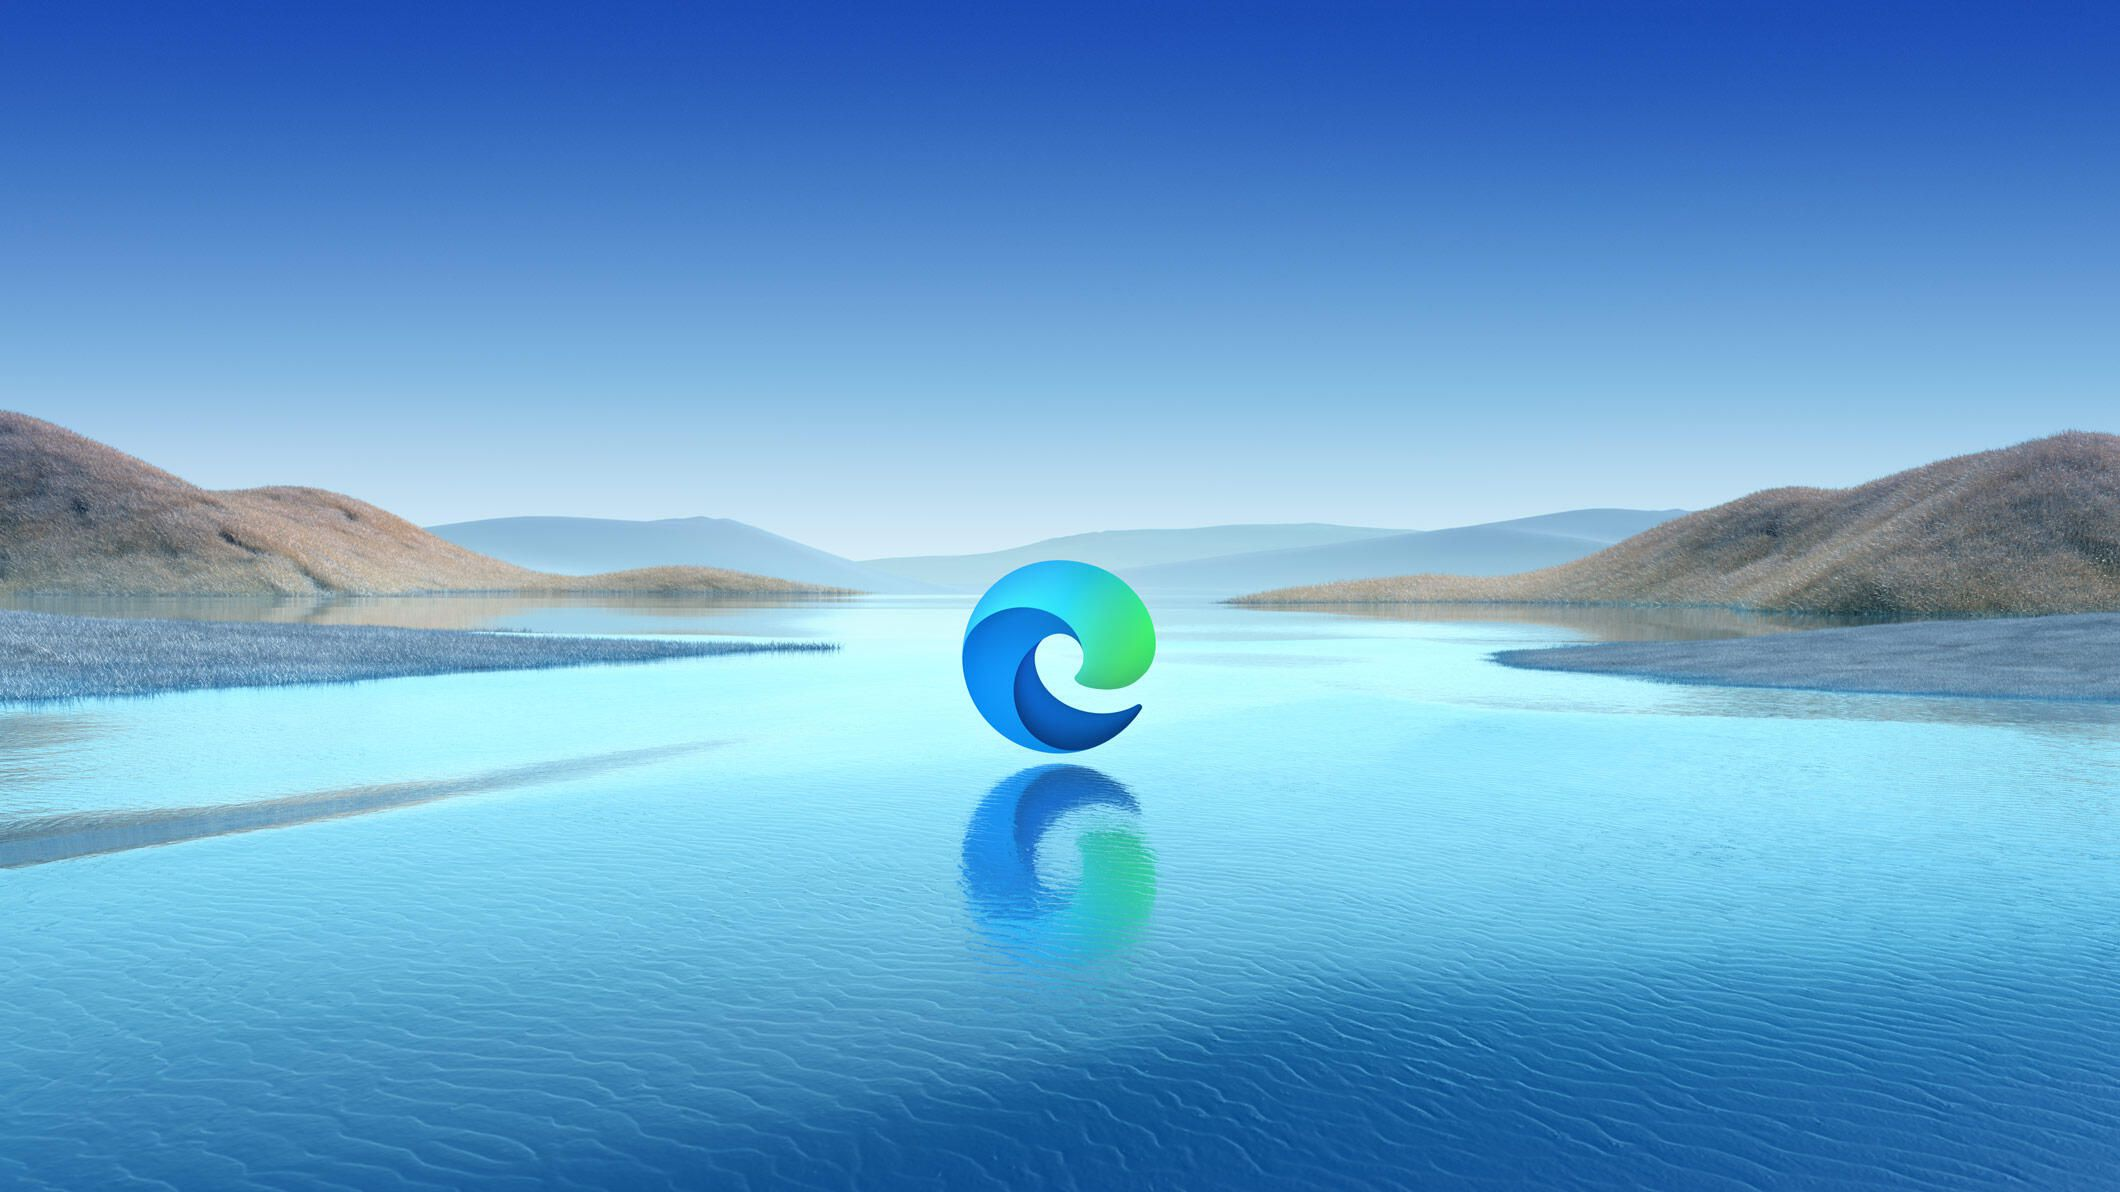 Microsoft Edge icon and logo